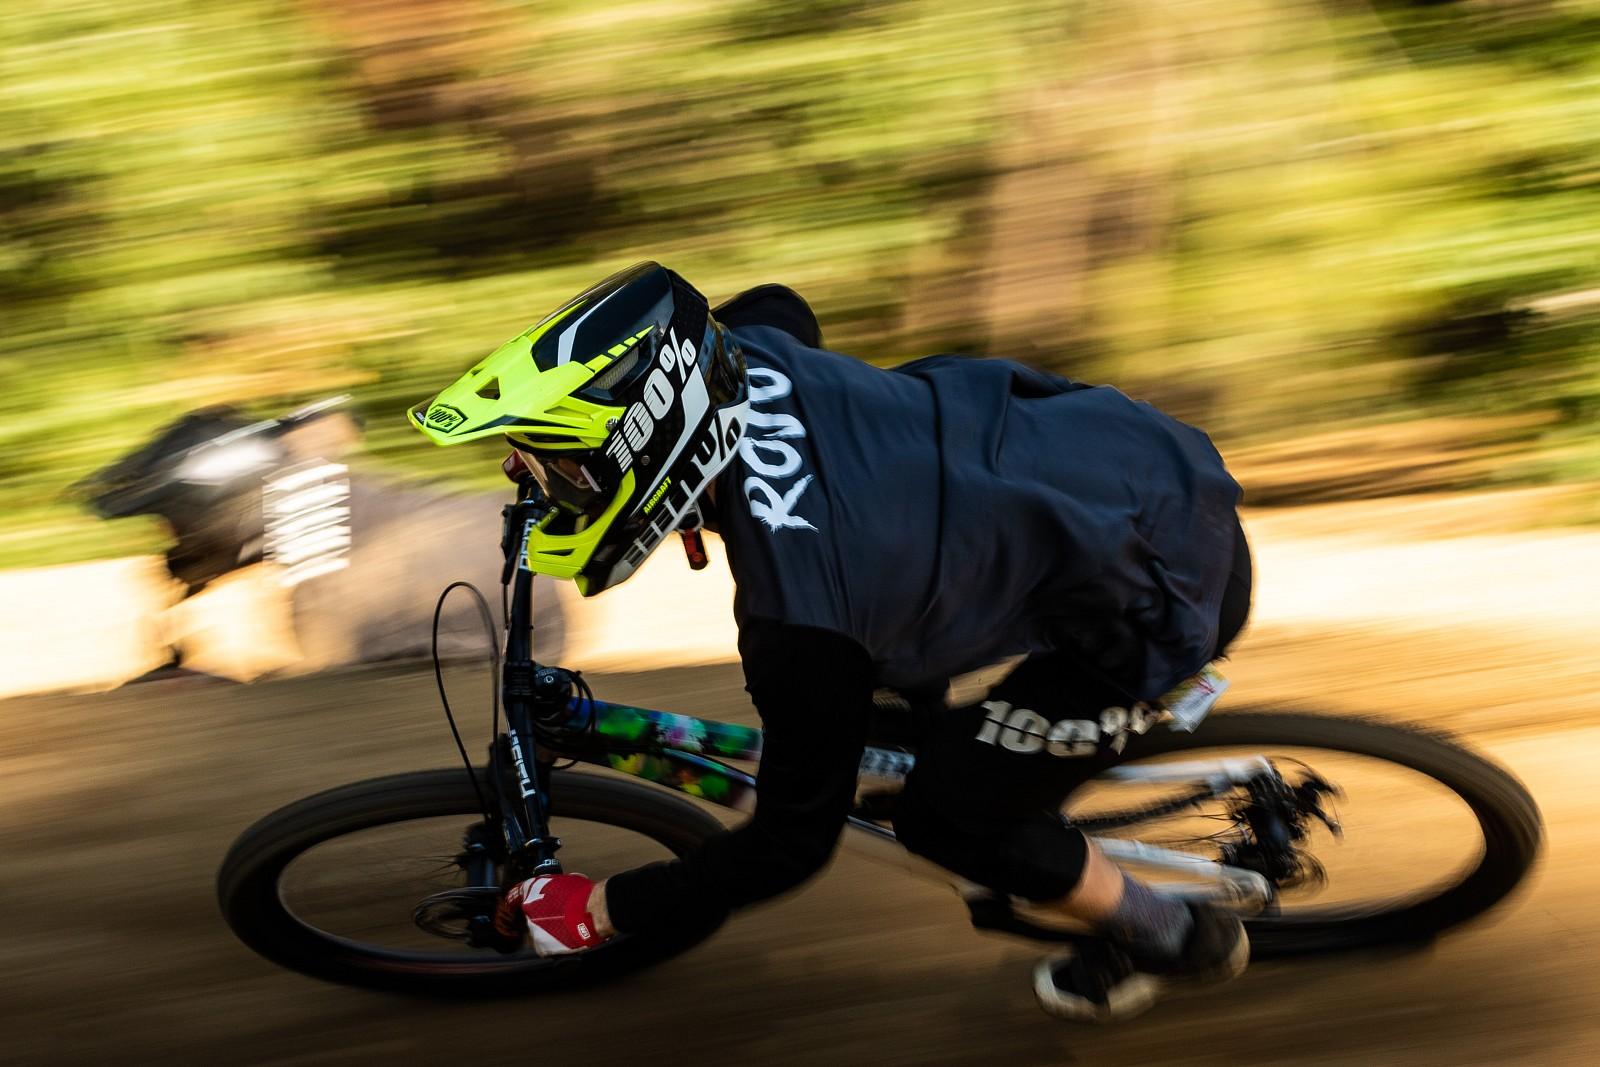 2019UsOpenSlalom-15 - ALeedomPhotography - Mountain Biking Pictures - Vital MTB